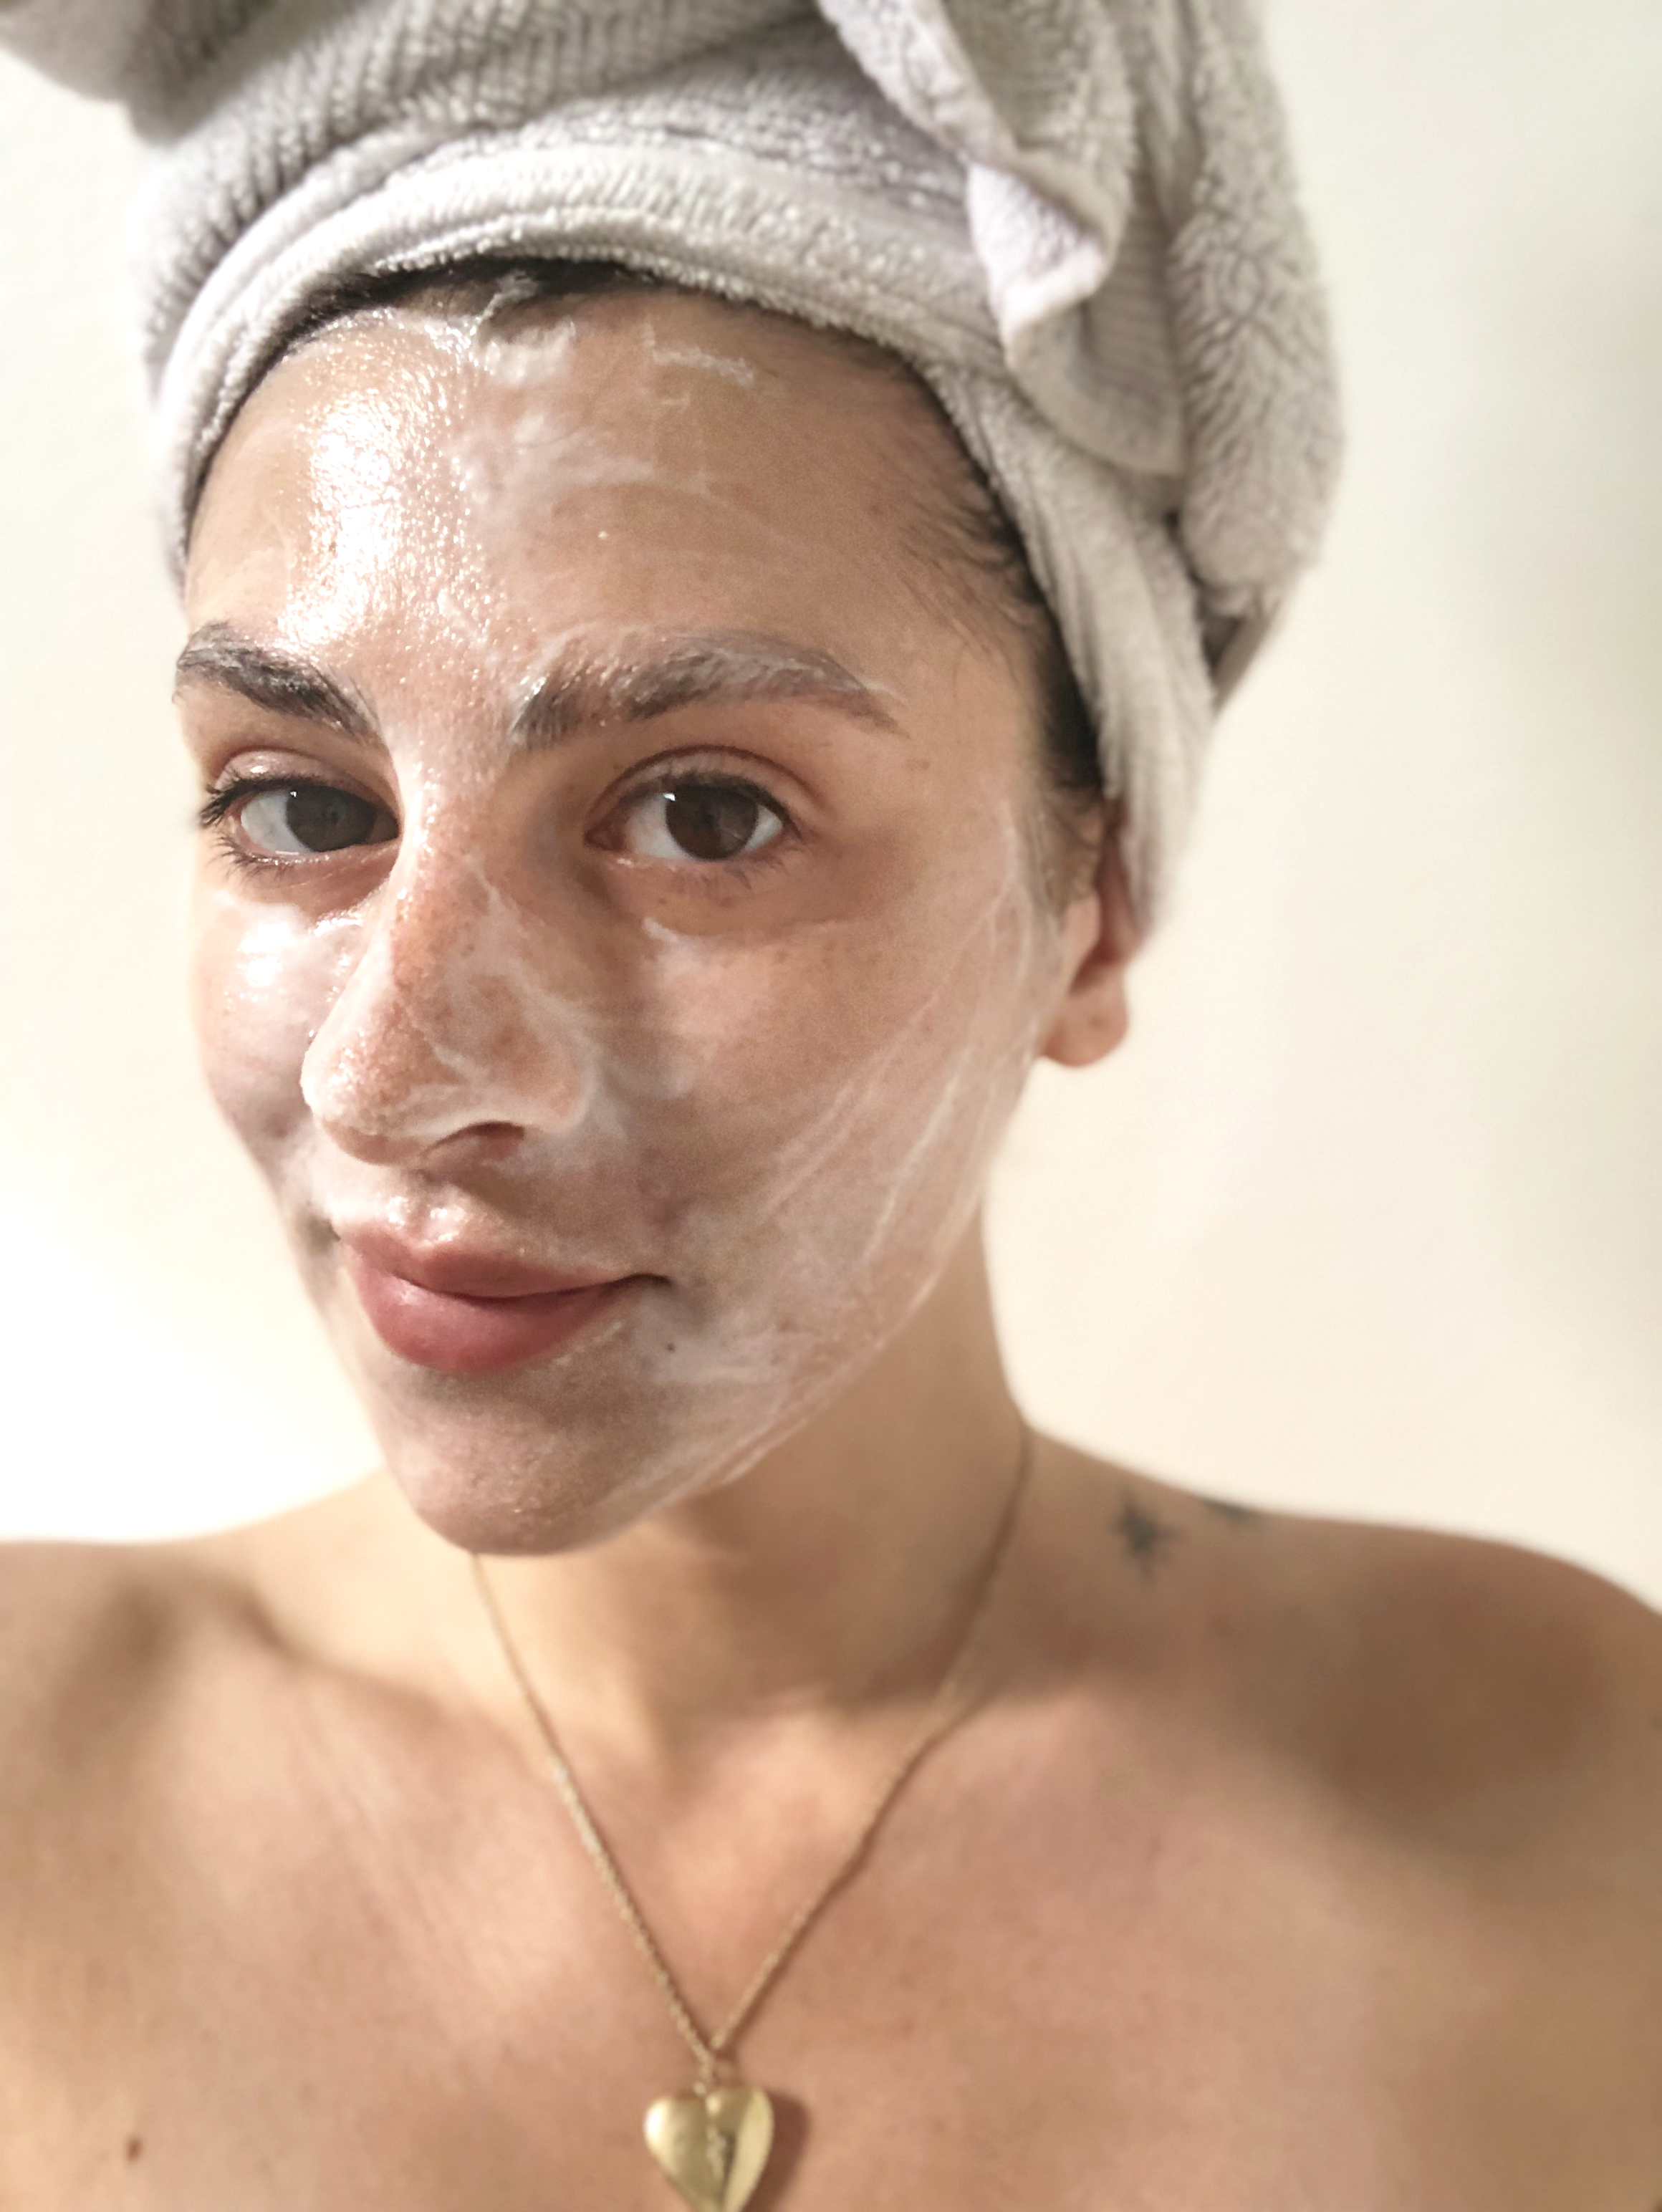 yogurt-face-mask-lactic-acid copy.jpg